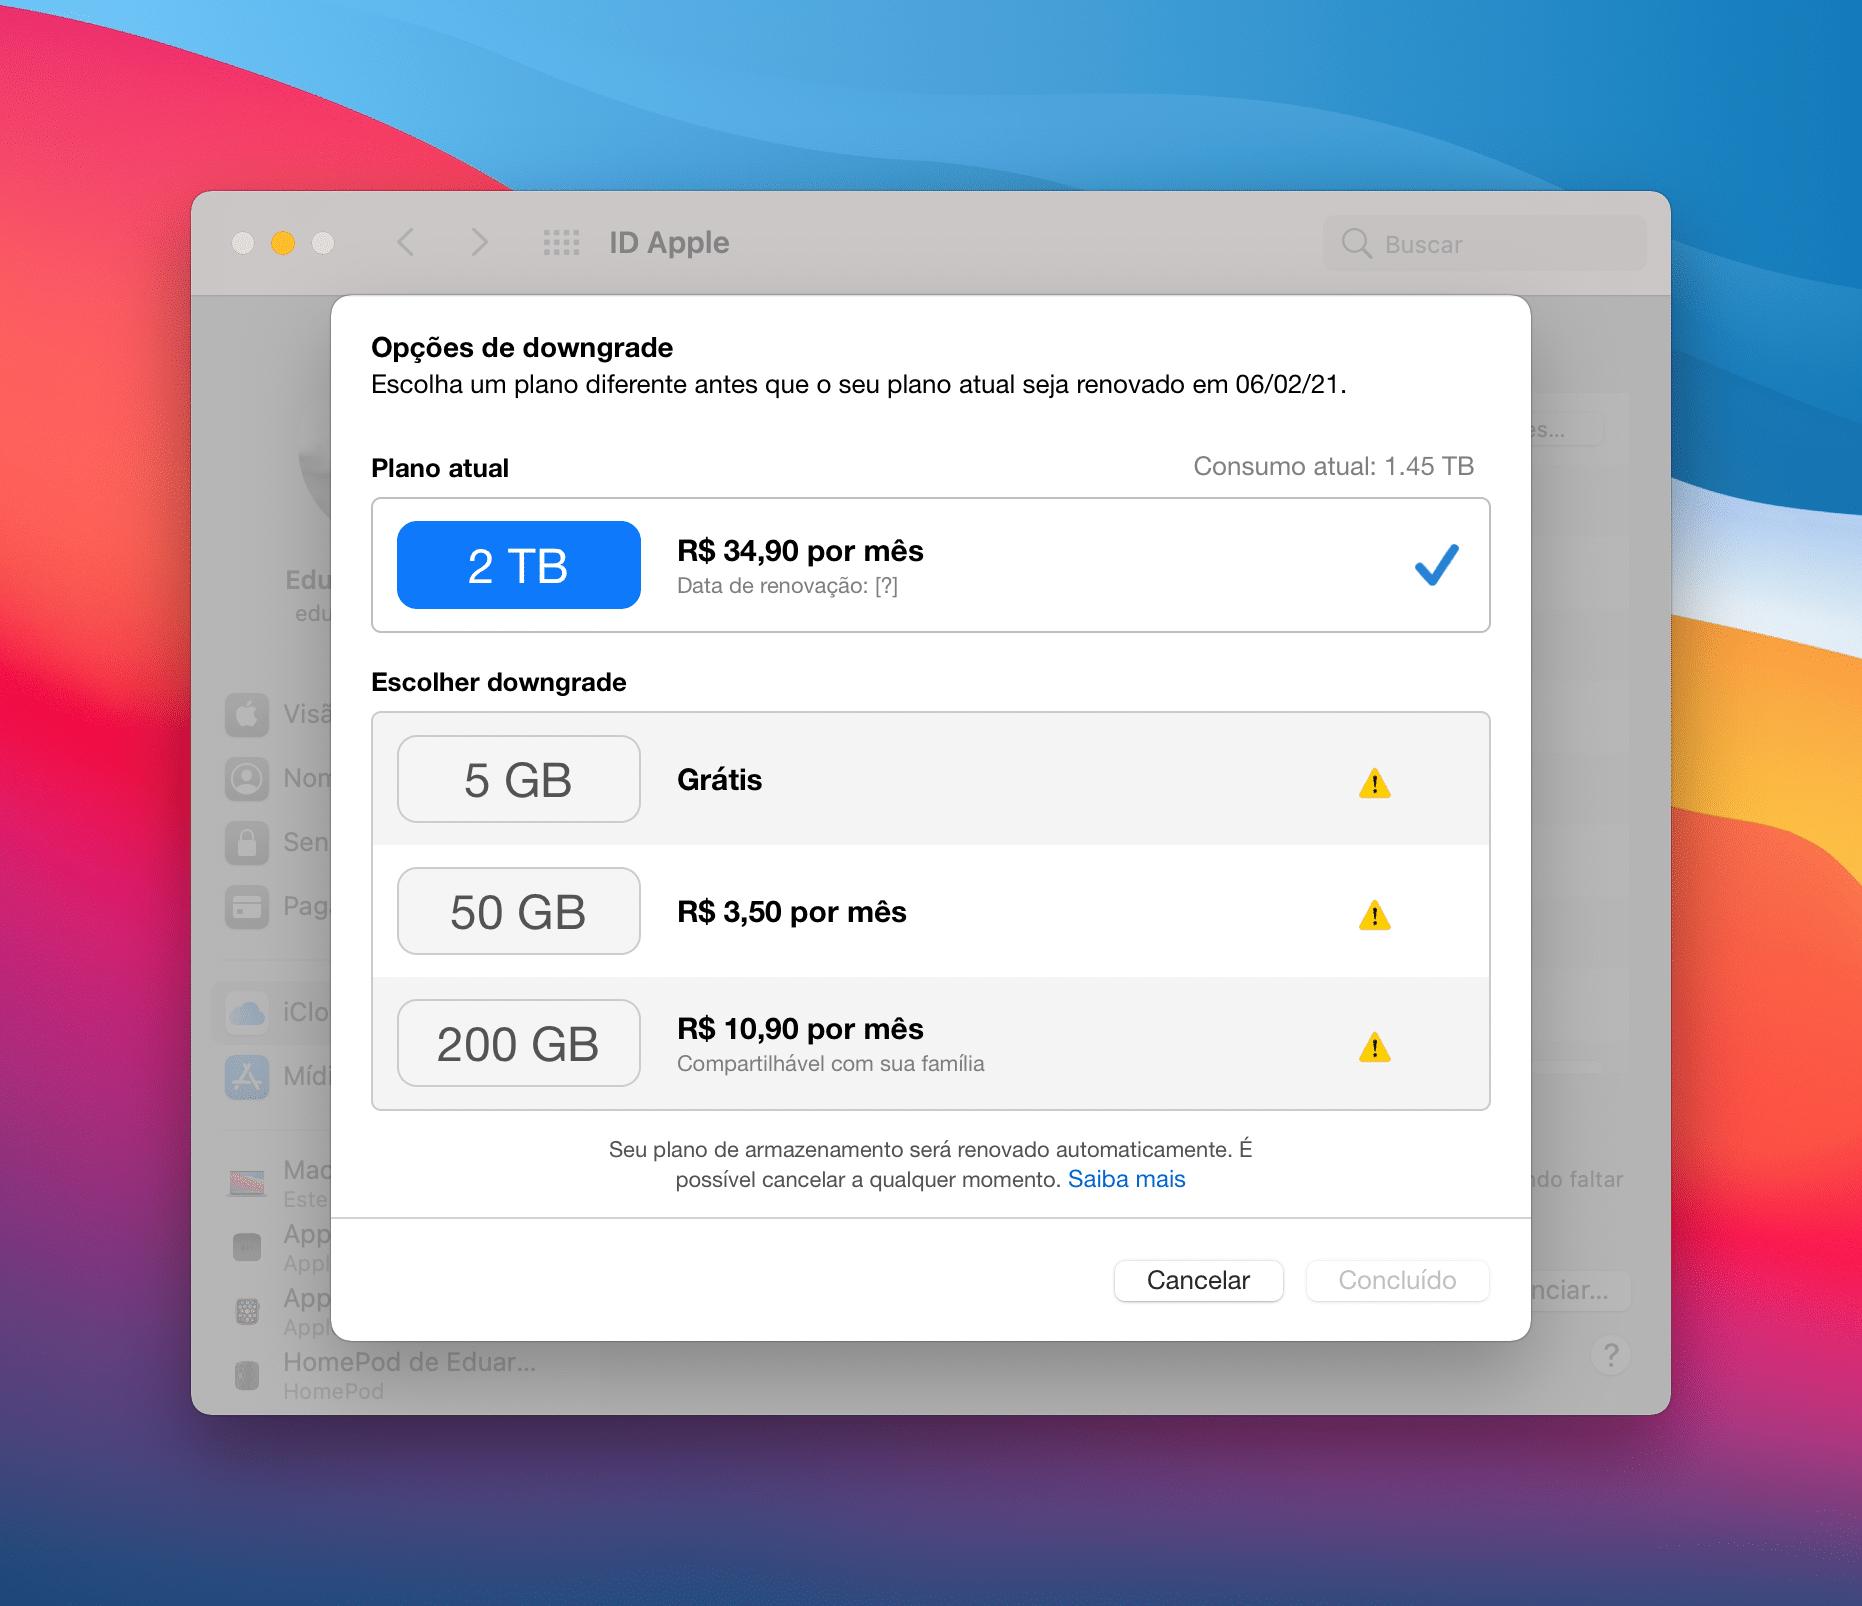 Downgrade de armazenamento no iCloud pelo iPhone